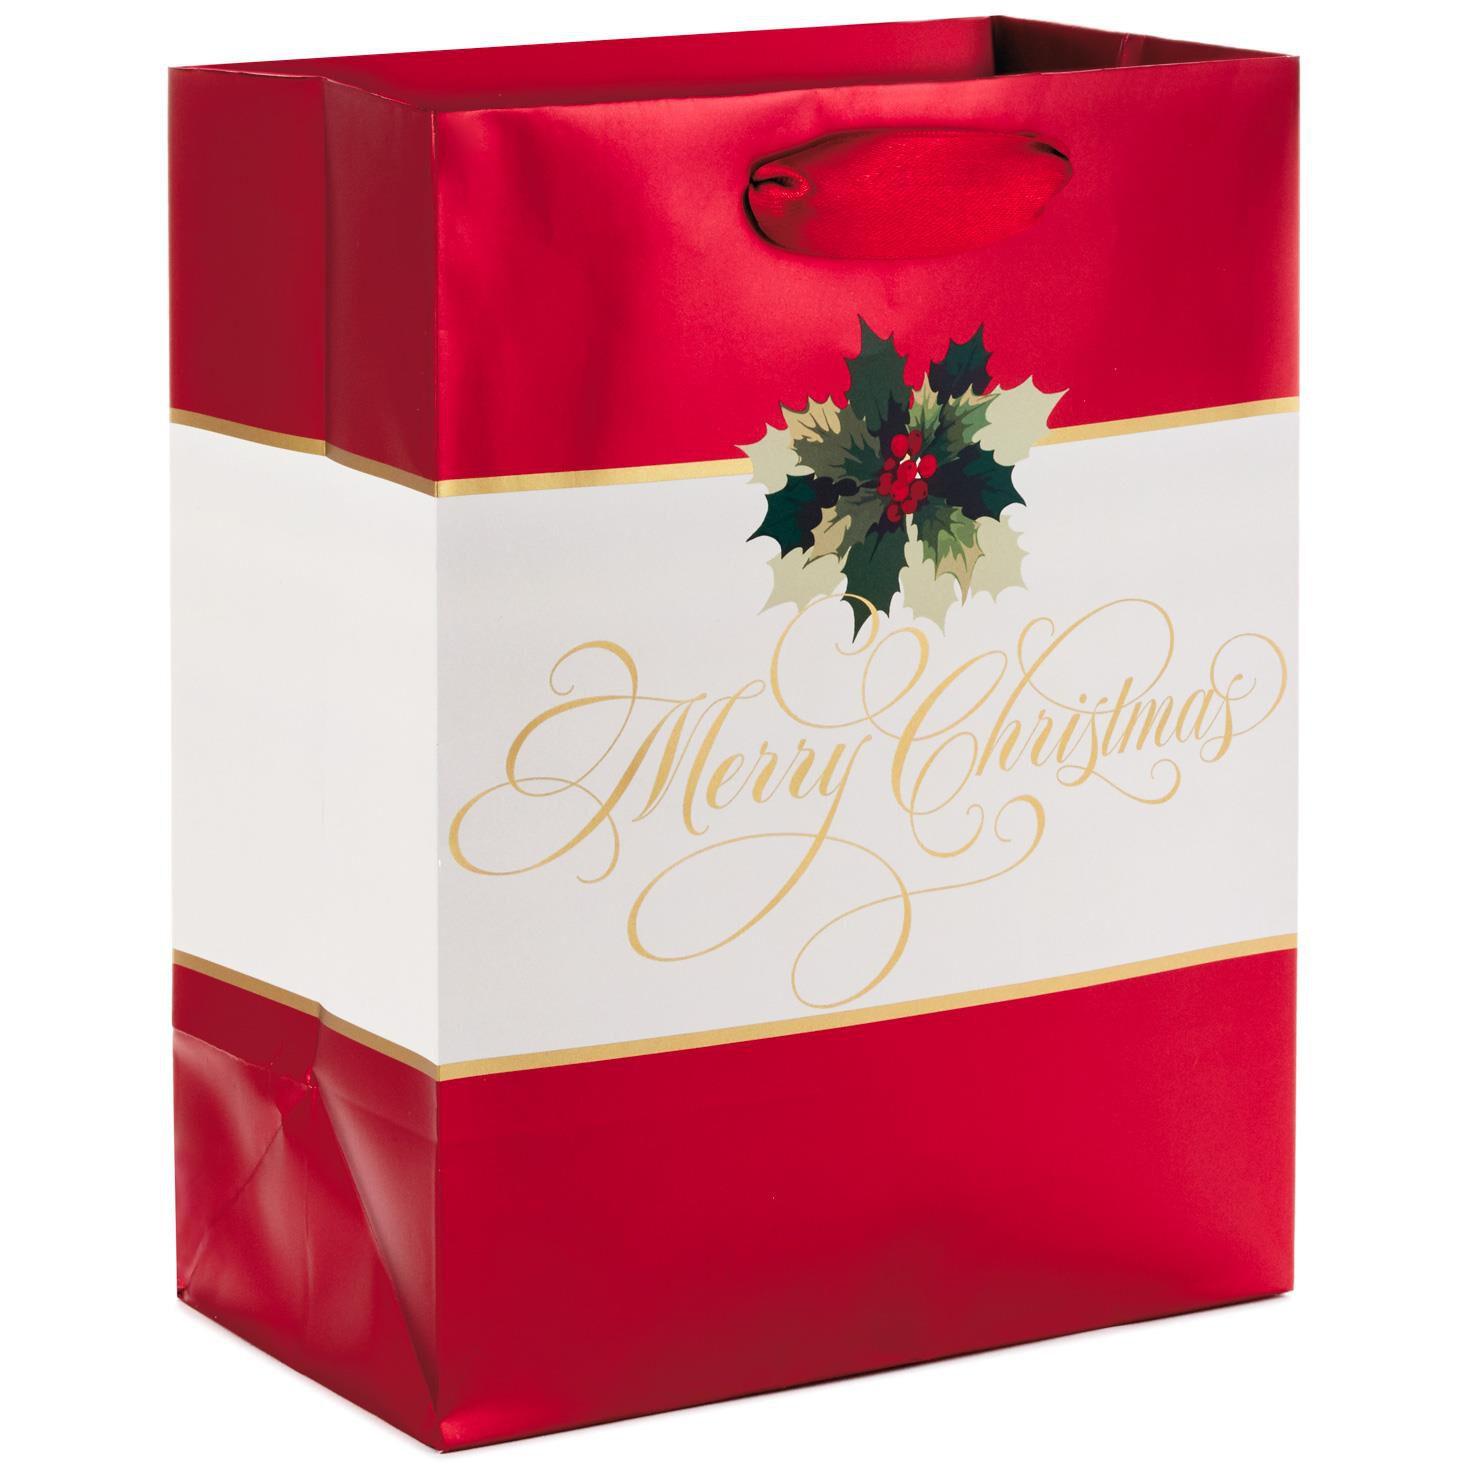 Classic Christmas Gift Wrap Collection - Gift Bags - Hallmark